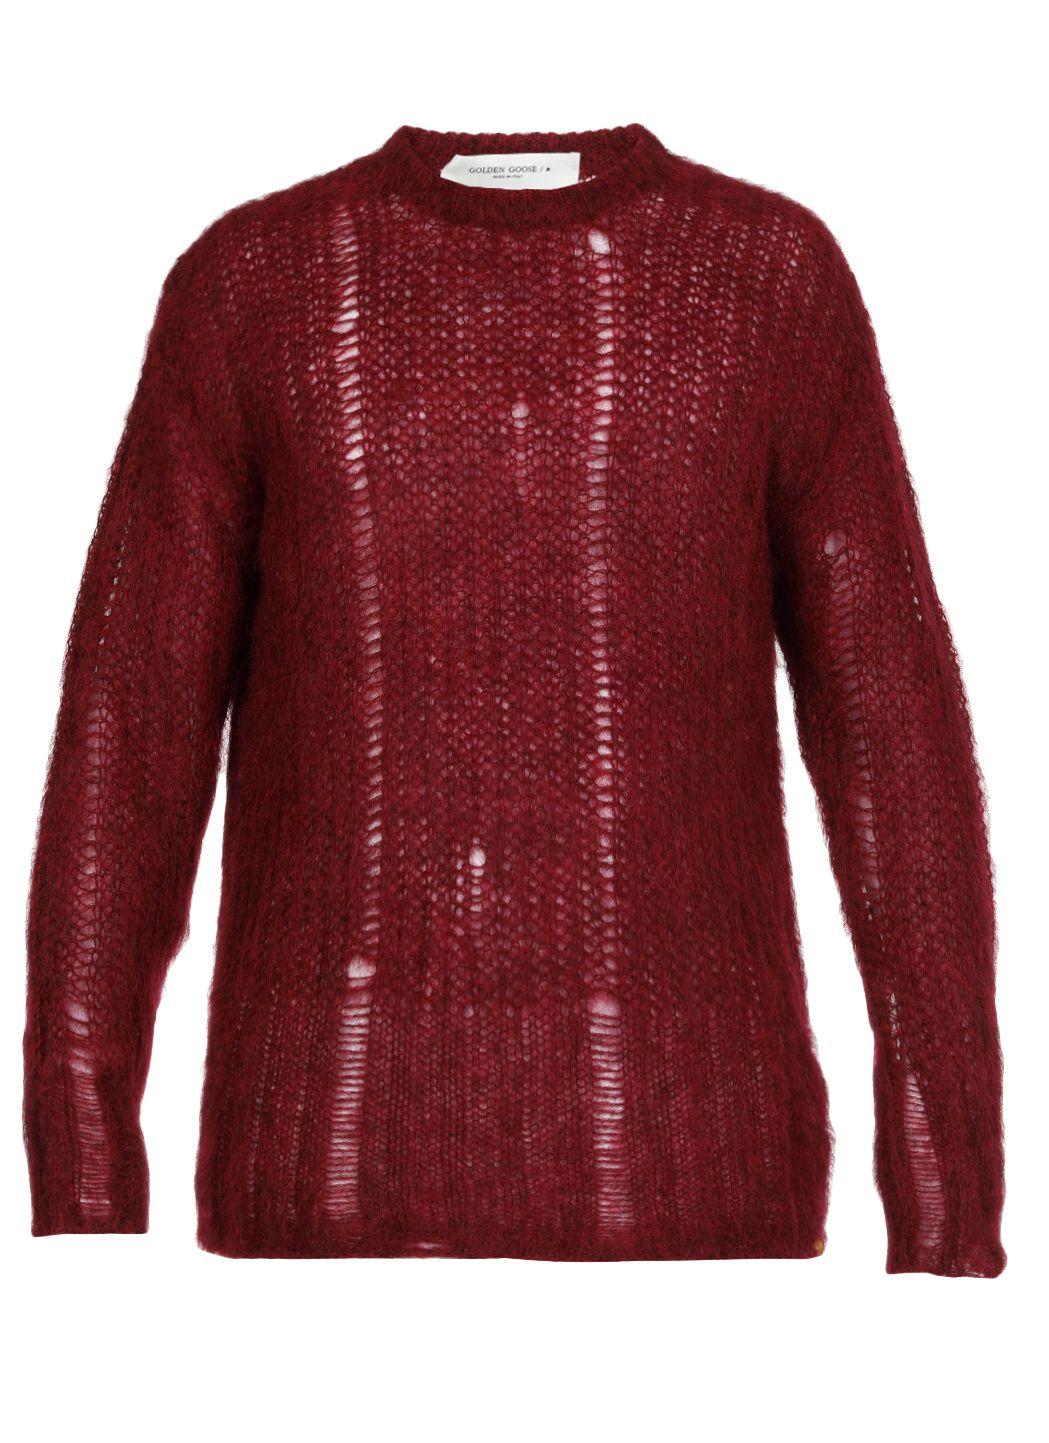 Sweater Algar color block